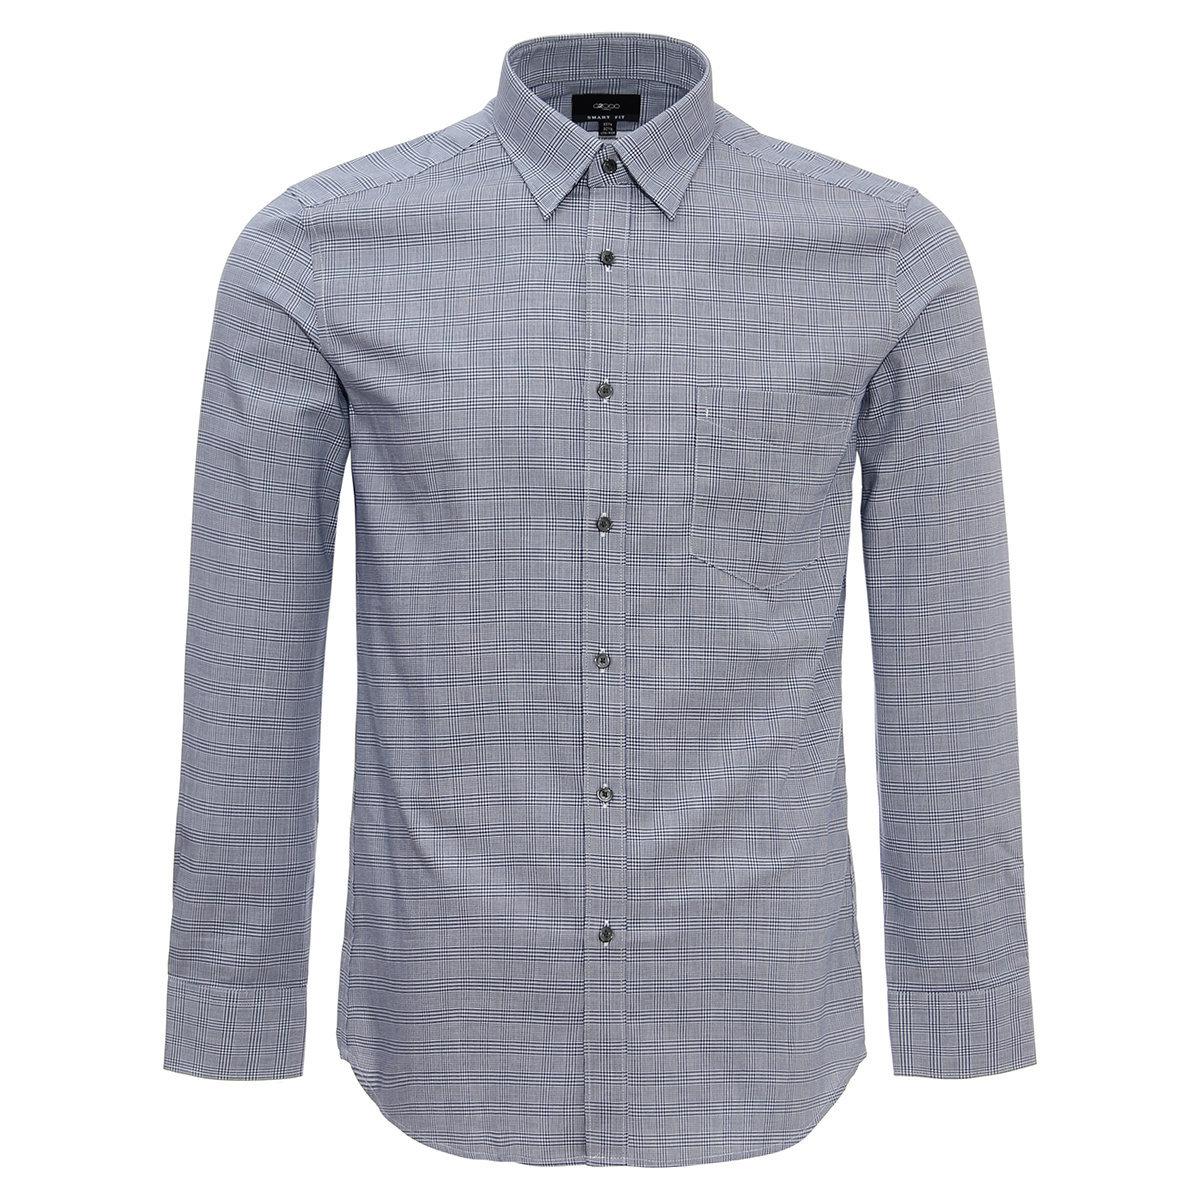 MEN'S Long Sleeve PLAID Shirt(navy)